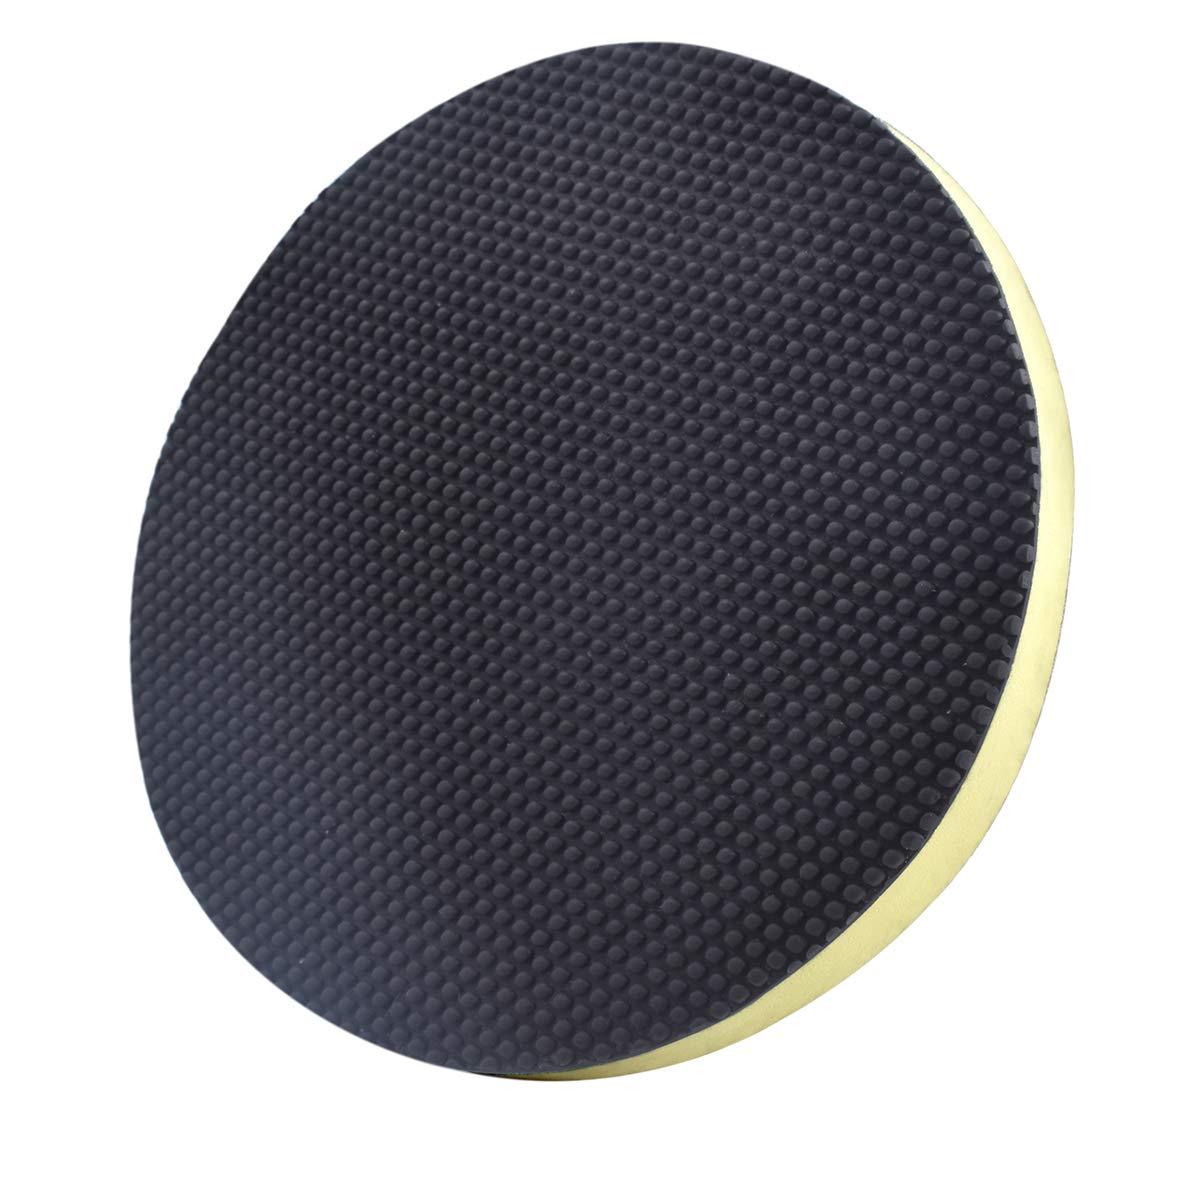 "JIANFA Clay Bar Pad 6"" Fine Grade Clay Pad for Polisher Clay Disc Clay Bar Wipe Foam Pad DA Polisher Pad for Car Detailing, Novel Detailing Tool"